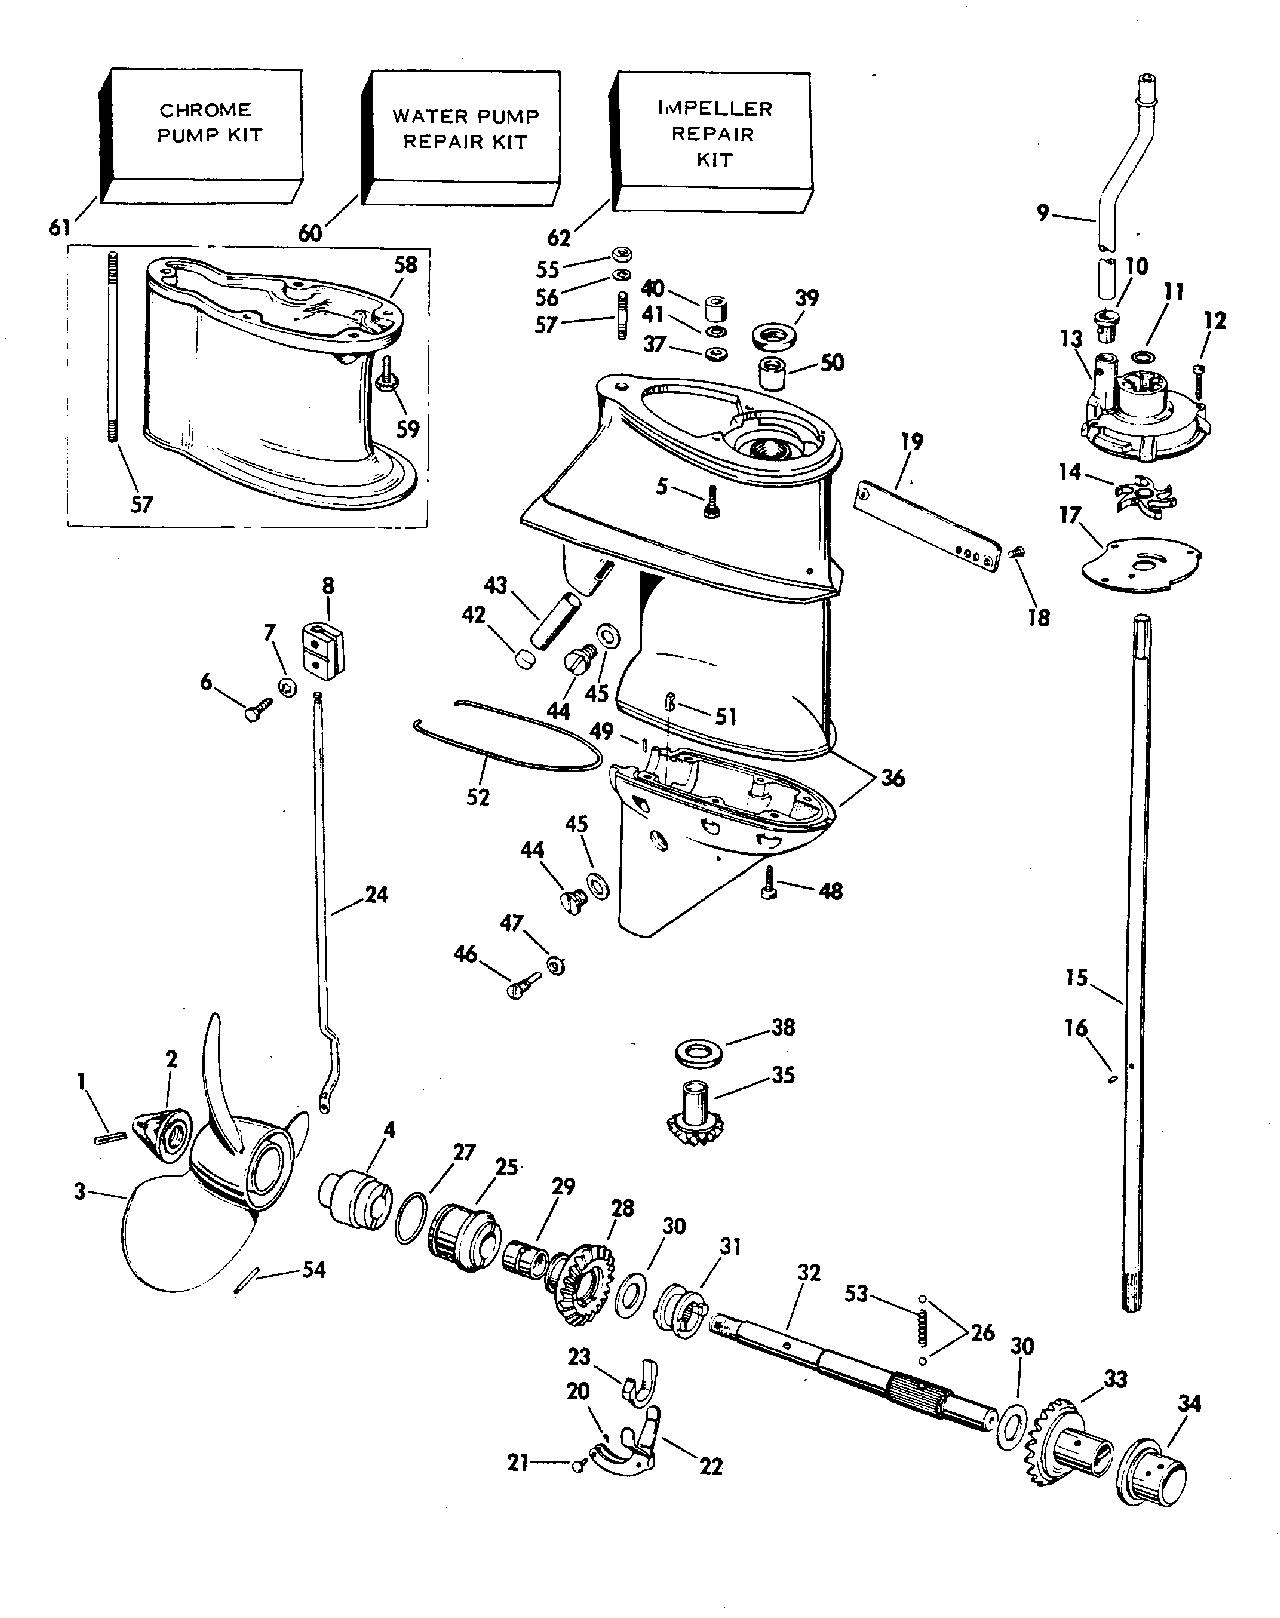 25 hp johnson outboard parts diagram structured media panel brp en 1977 25r77h gearcase